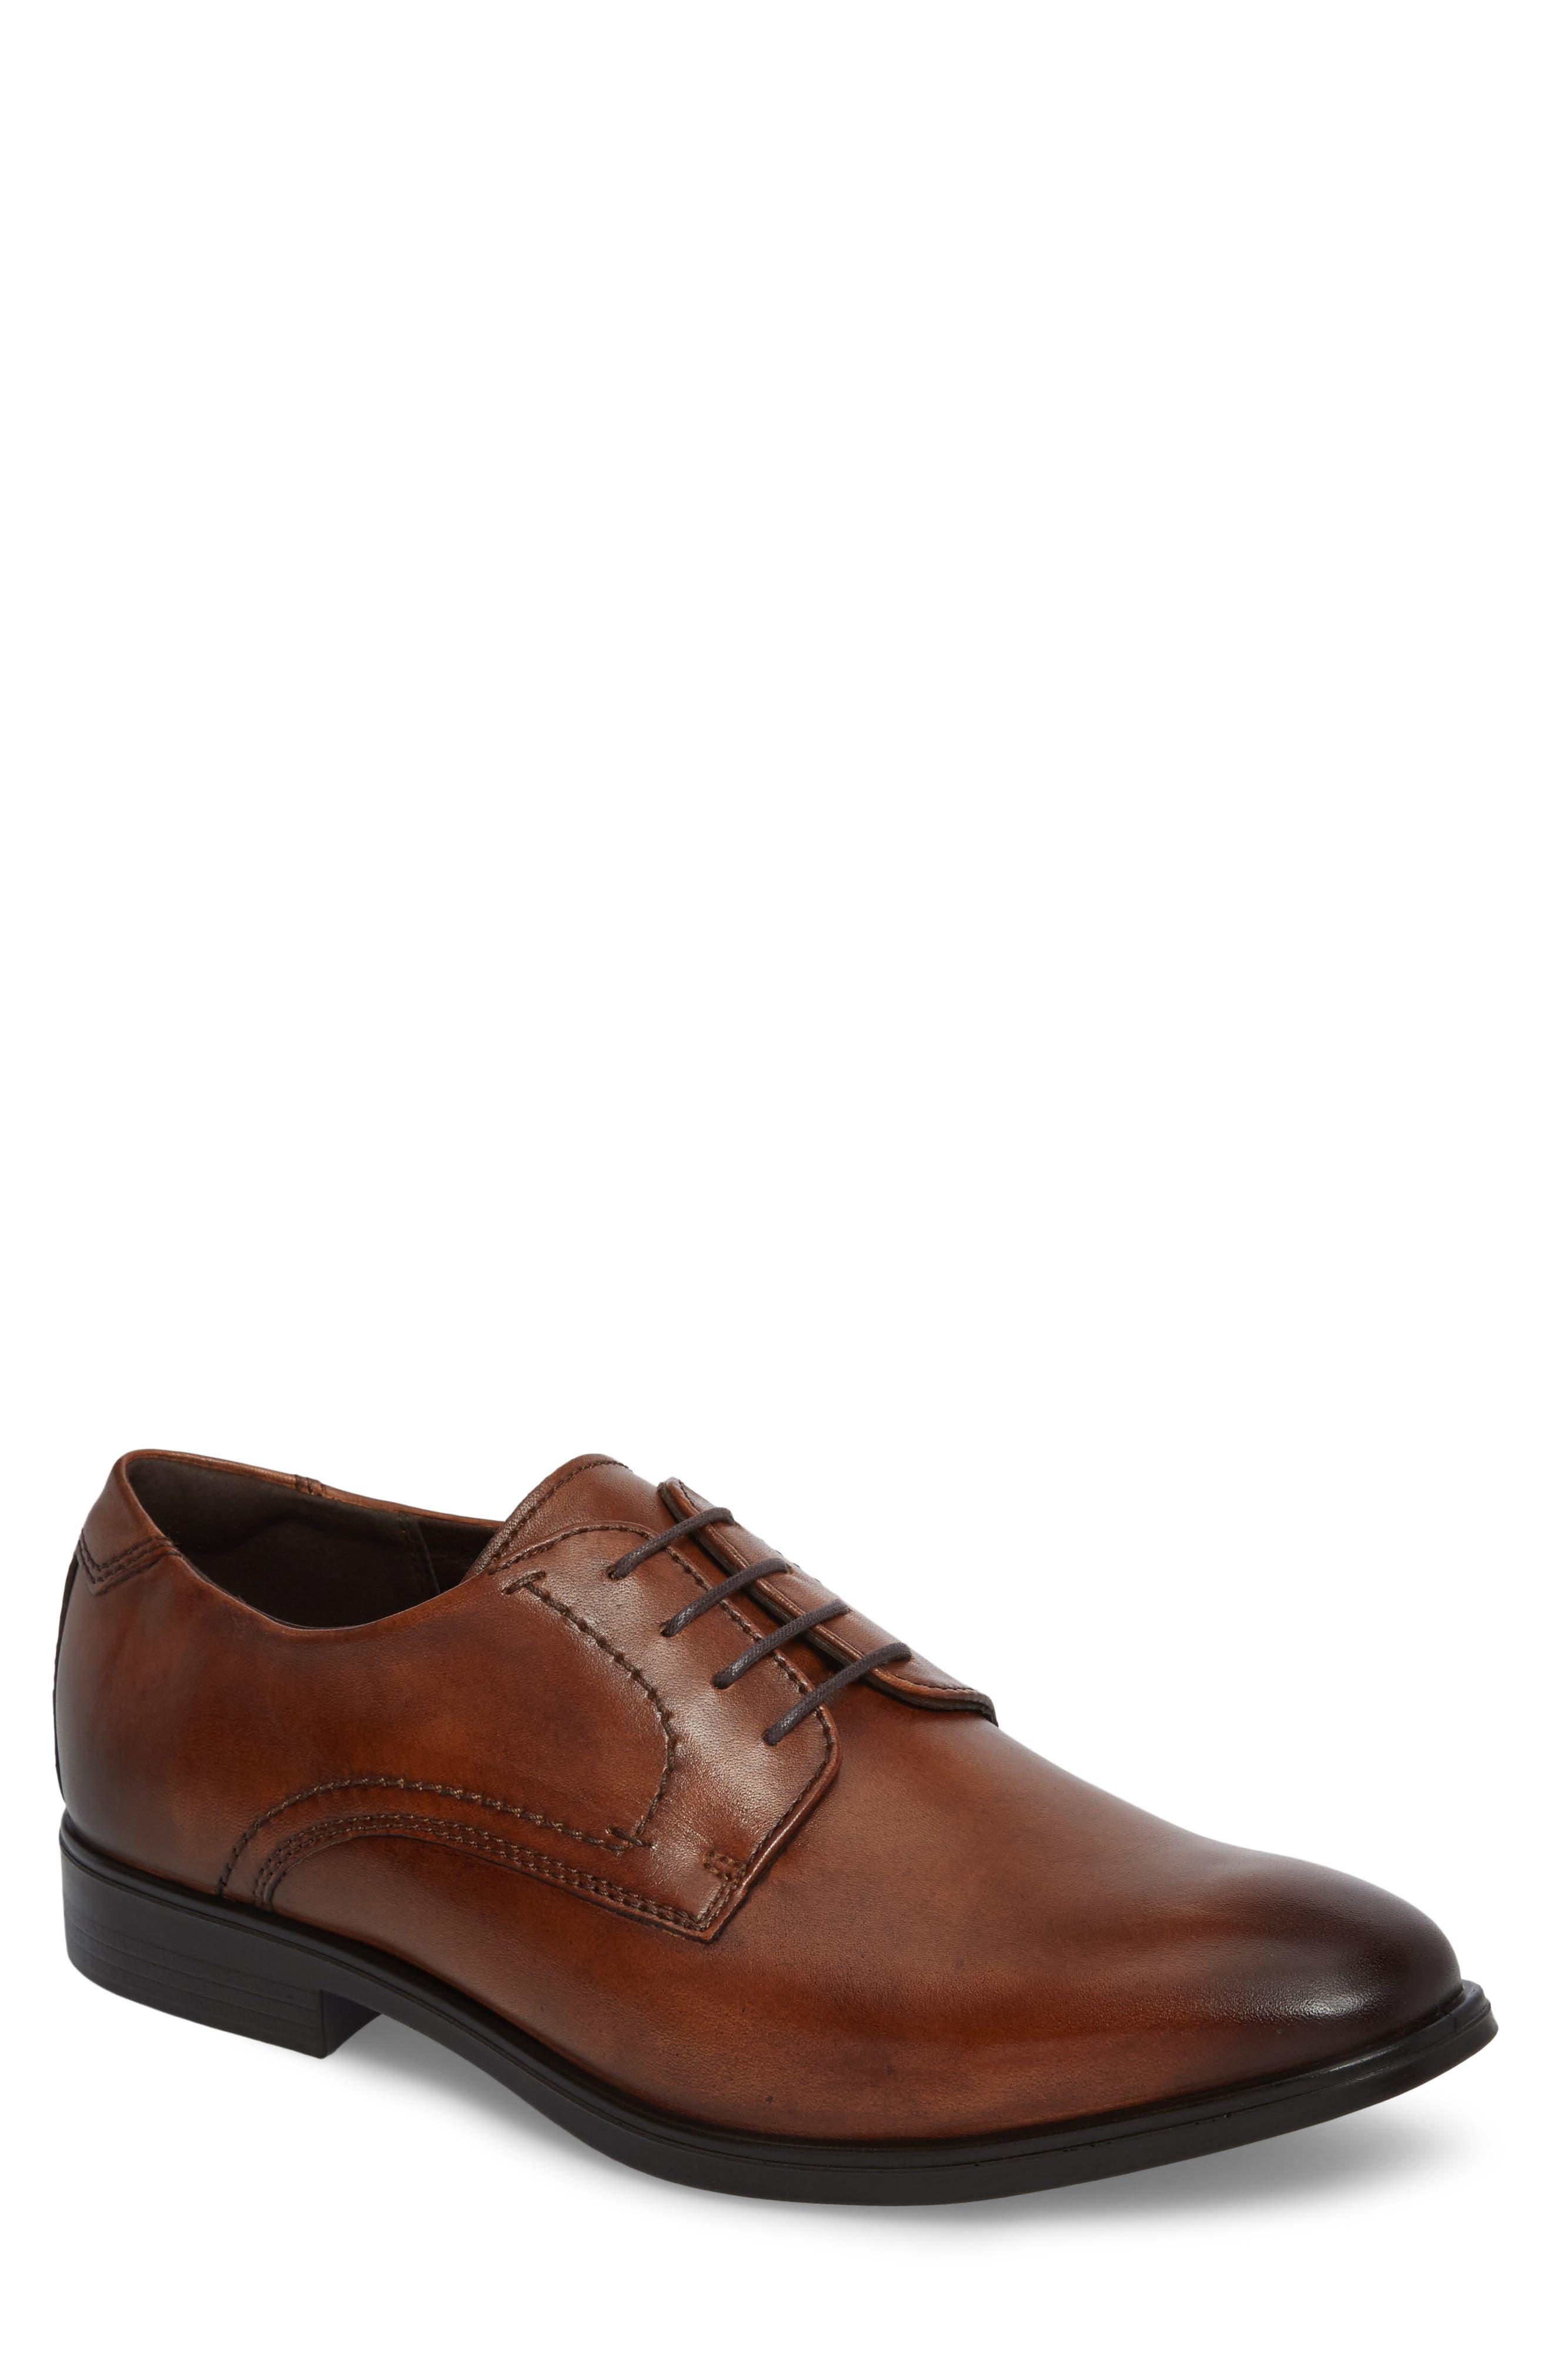 Melbourne Plain Toe Derby,                             Main thumbnail 1, color,                             Amber Leather